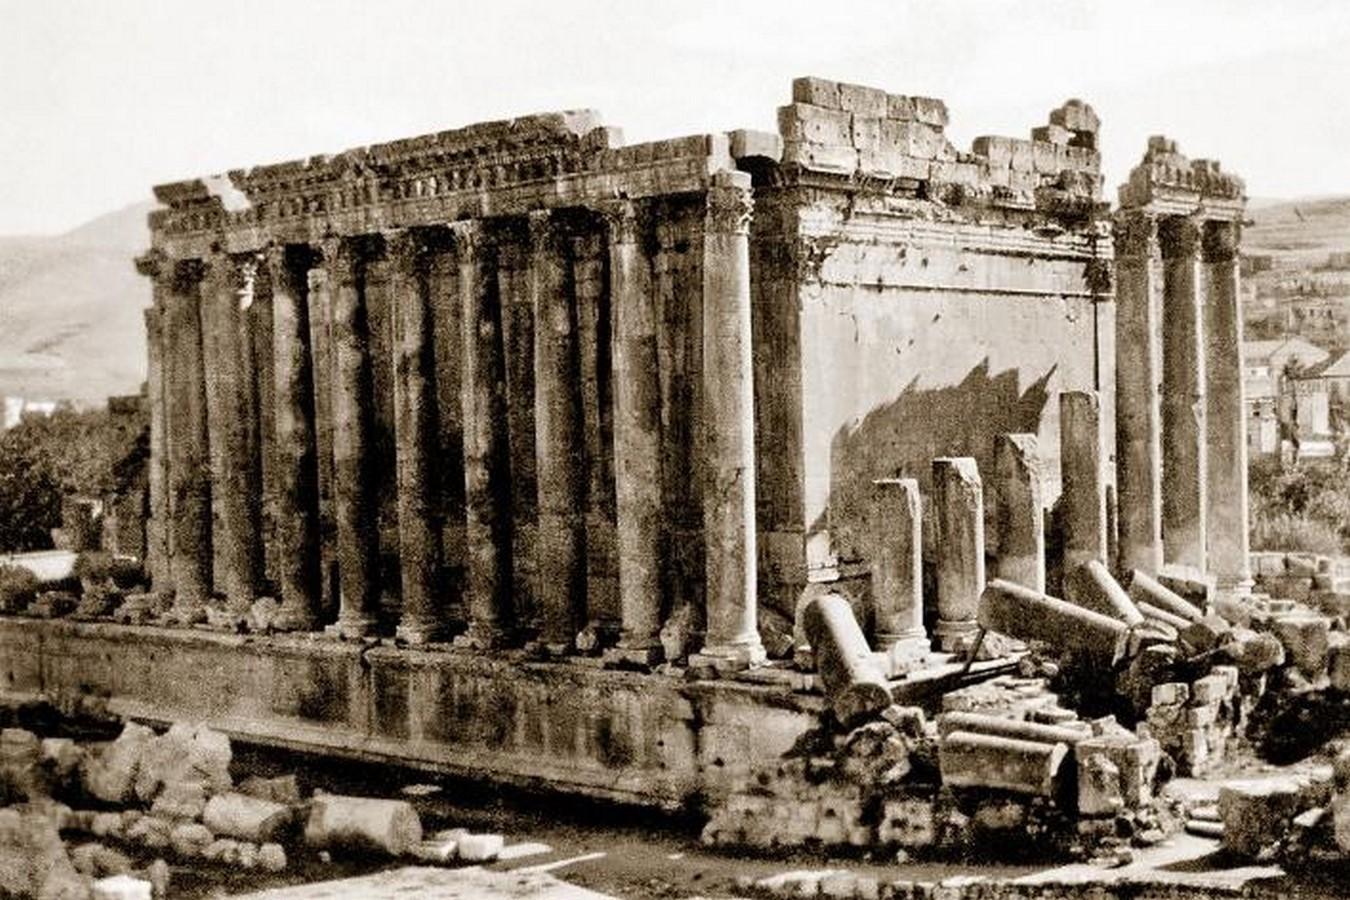 The temple of Bacchus, Lebanon - Sheet3